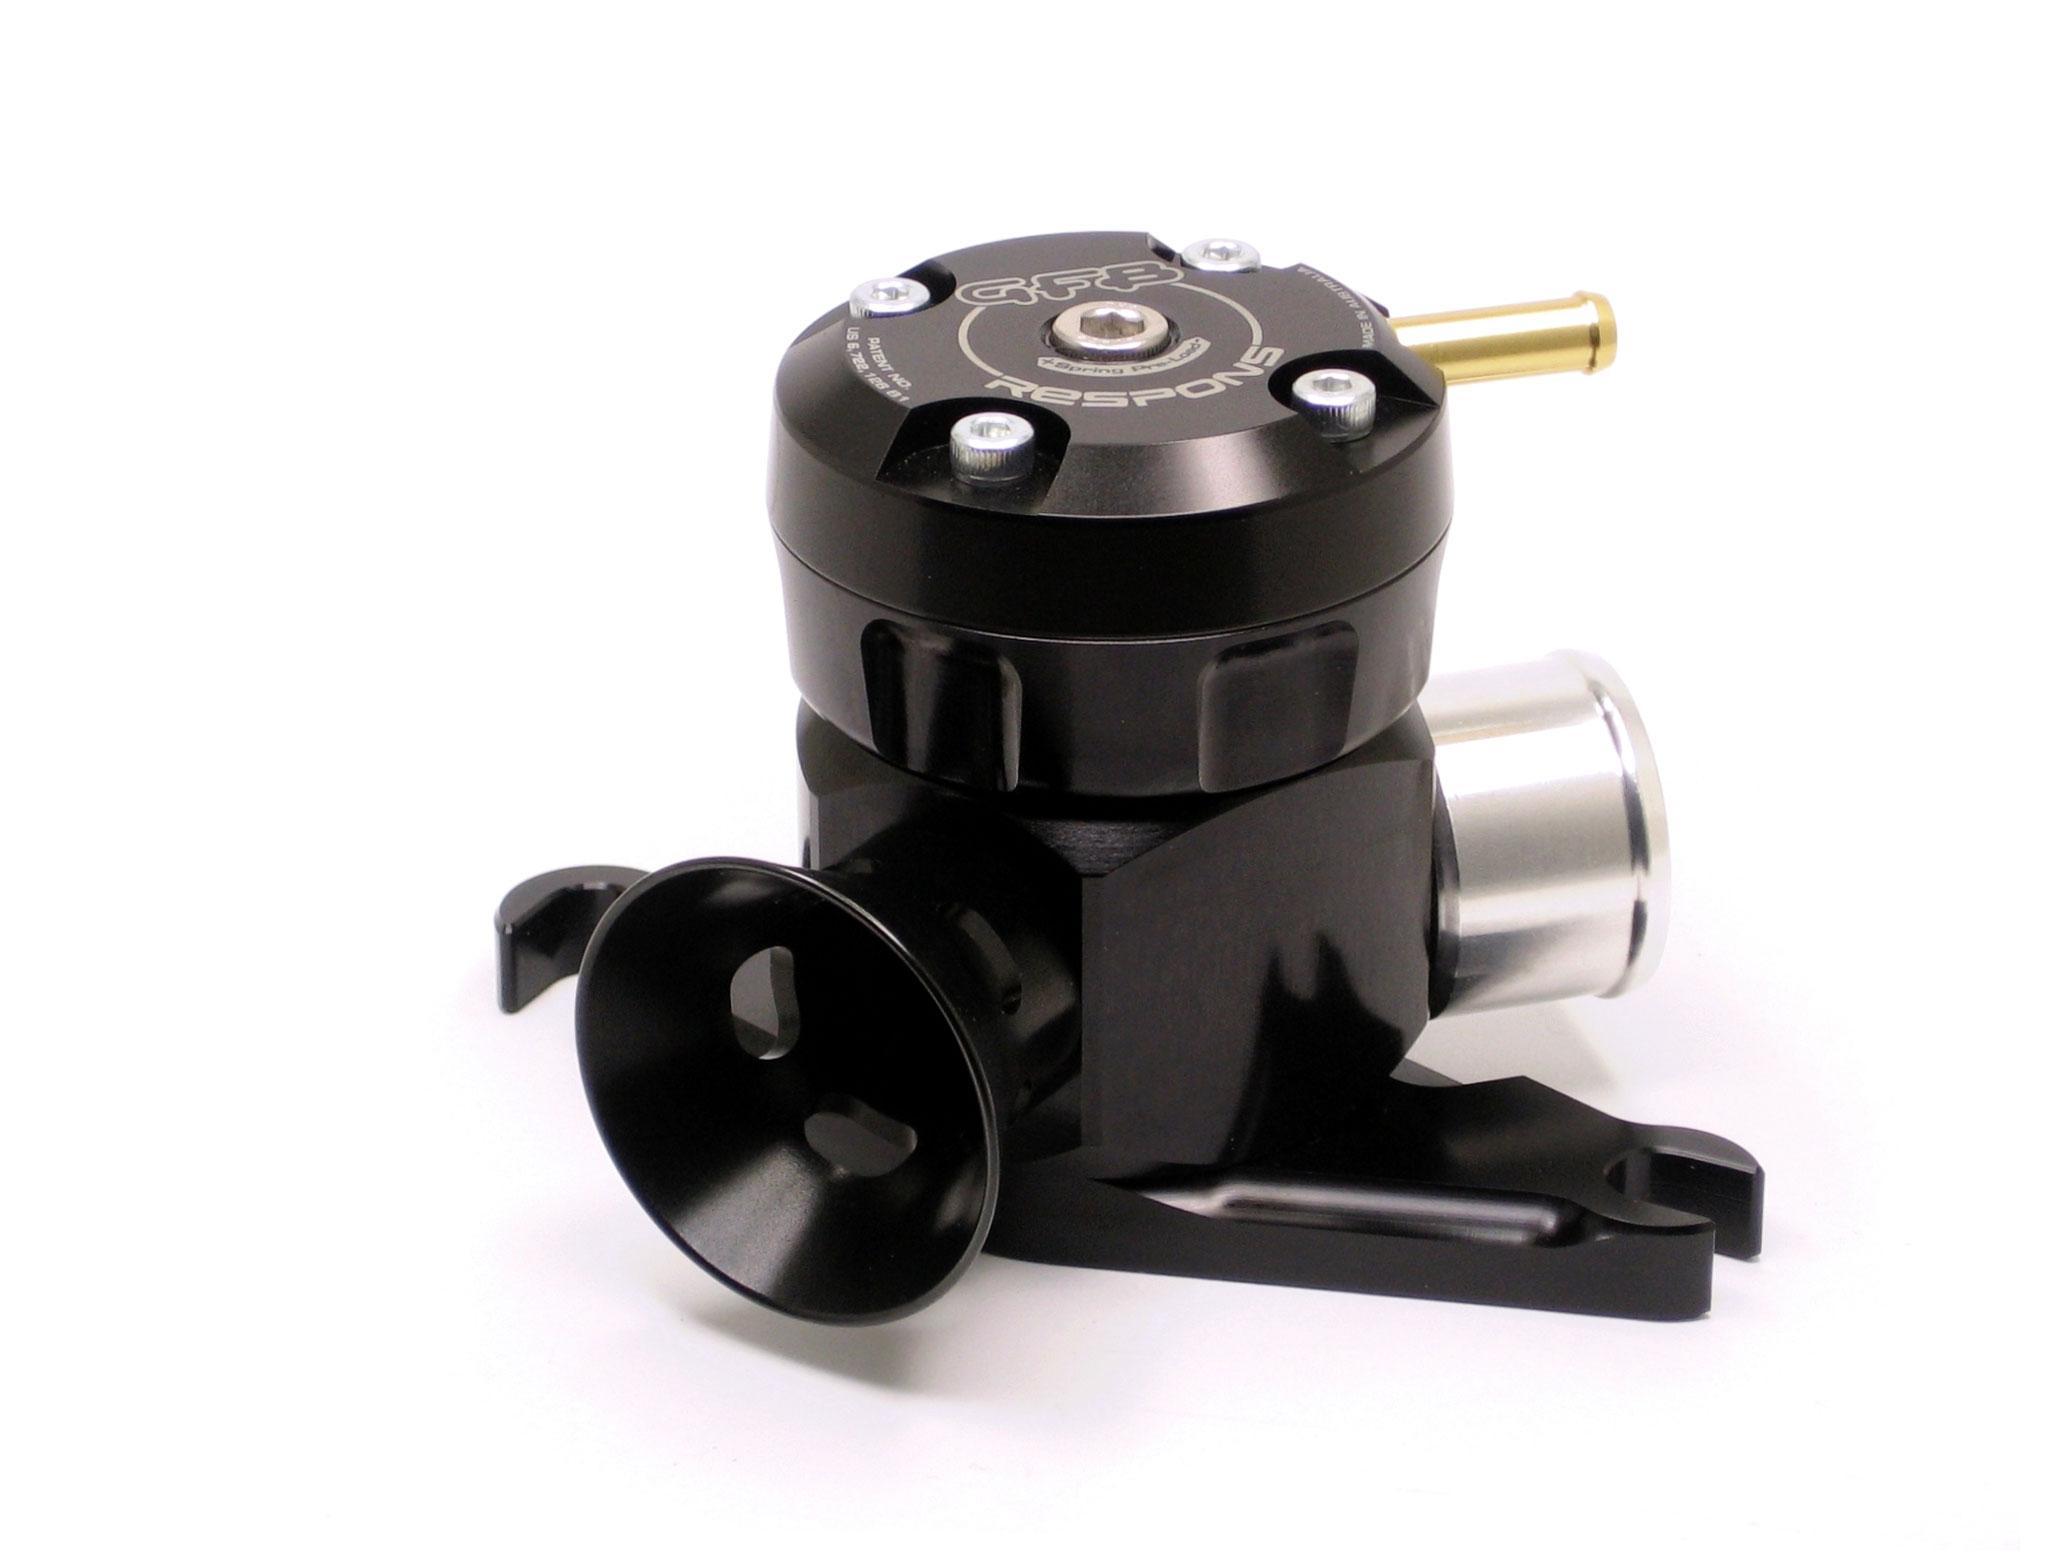 T9000 Respons TMS T9000 adjustable-bias venting diverter valve / blow-off valve